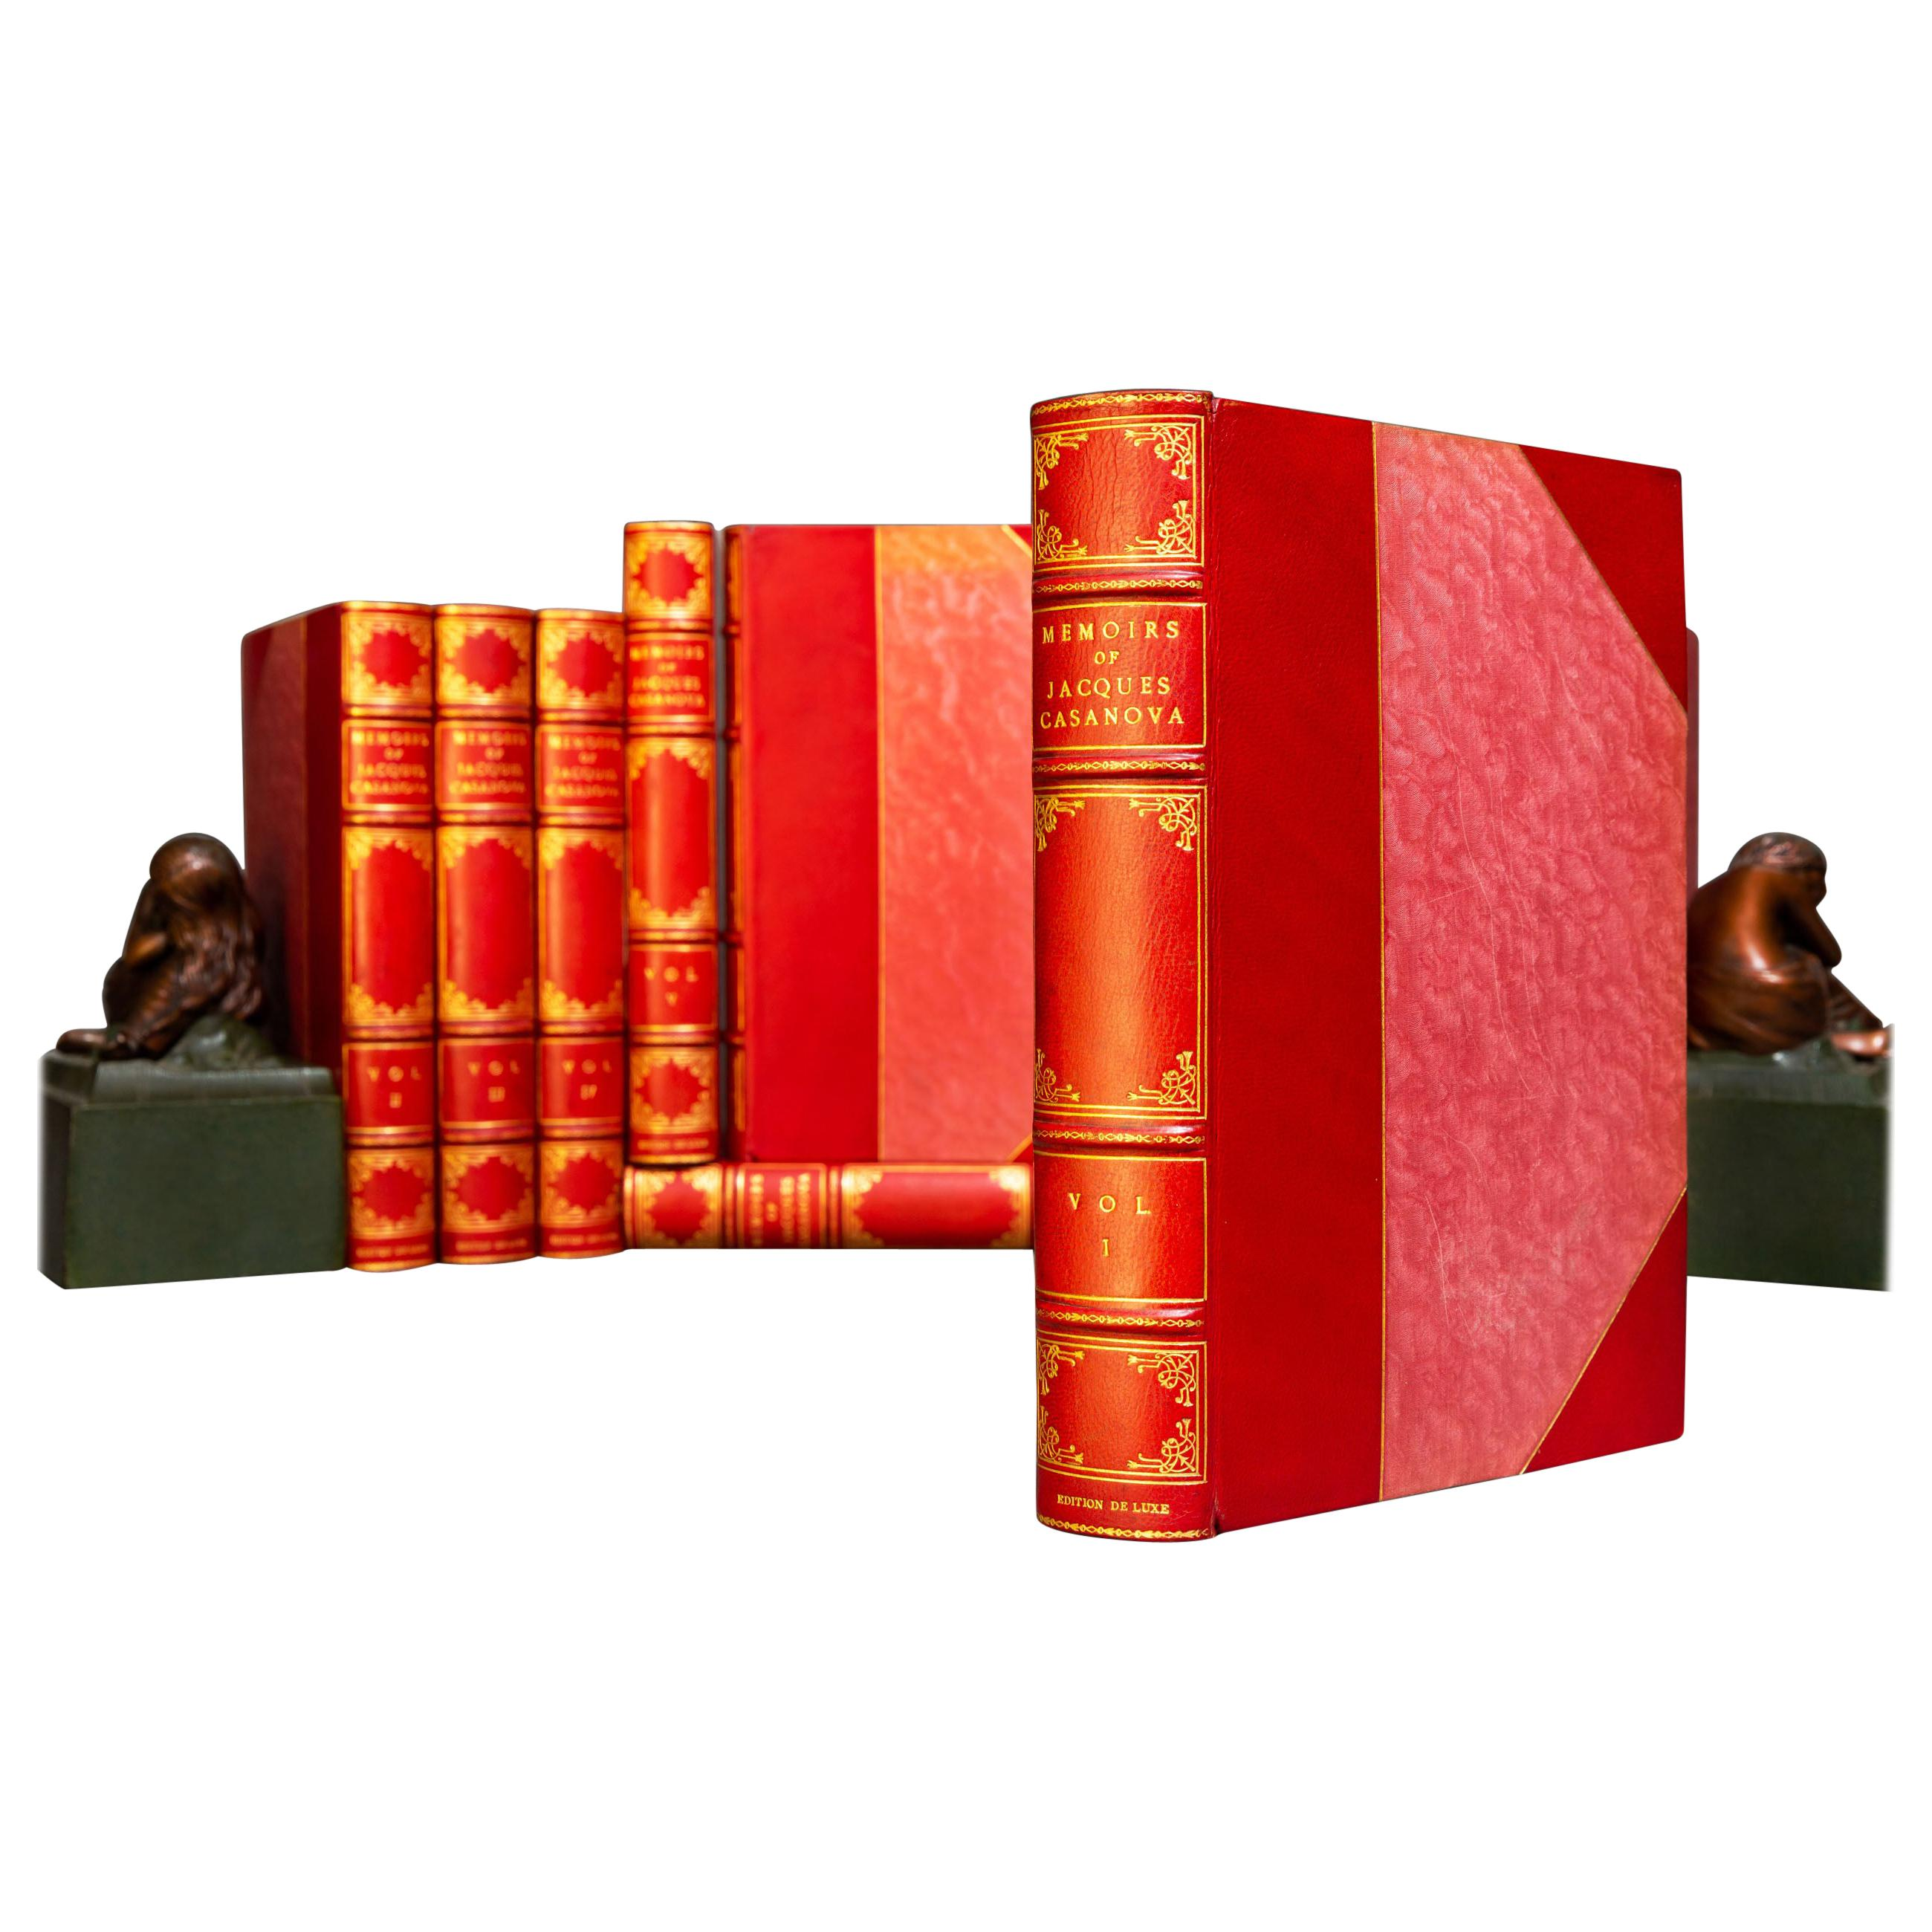 Book Sets, Jacques Casanova, The Memoirs of Casanova